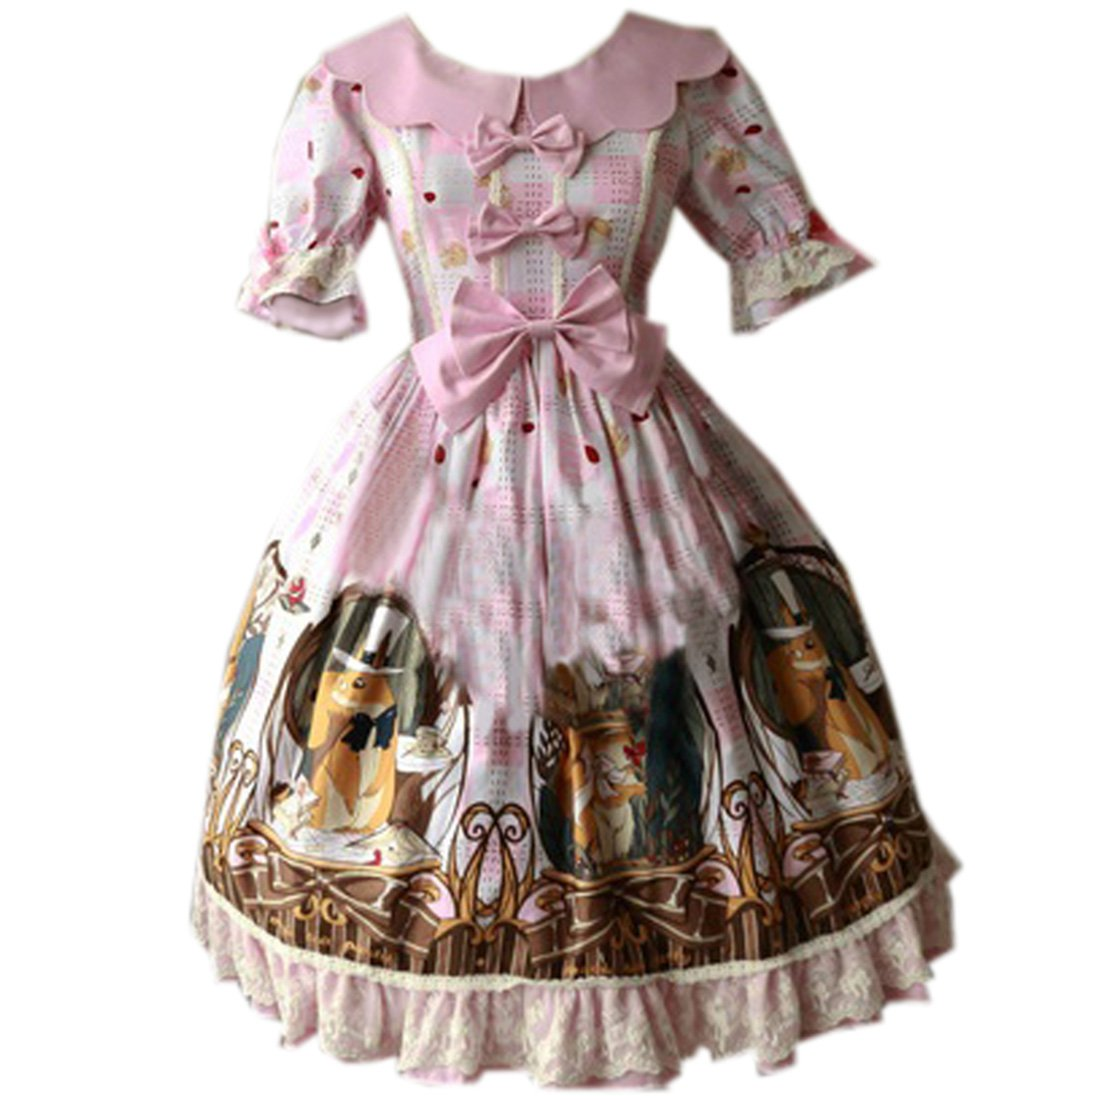 Partiss Womens Classic Cute Squirrel Printed Sweet Lolita Dress Summer Bowknots, L, Light Pink